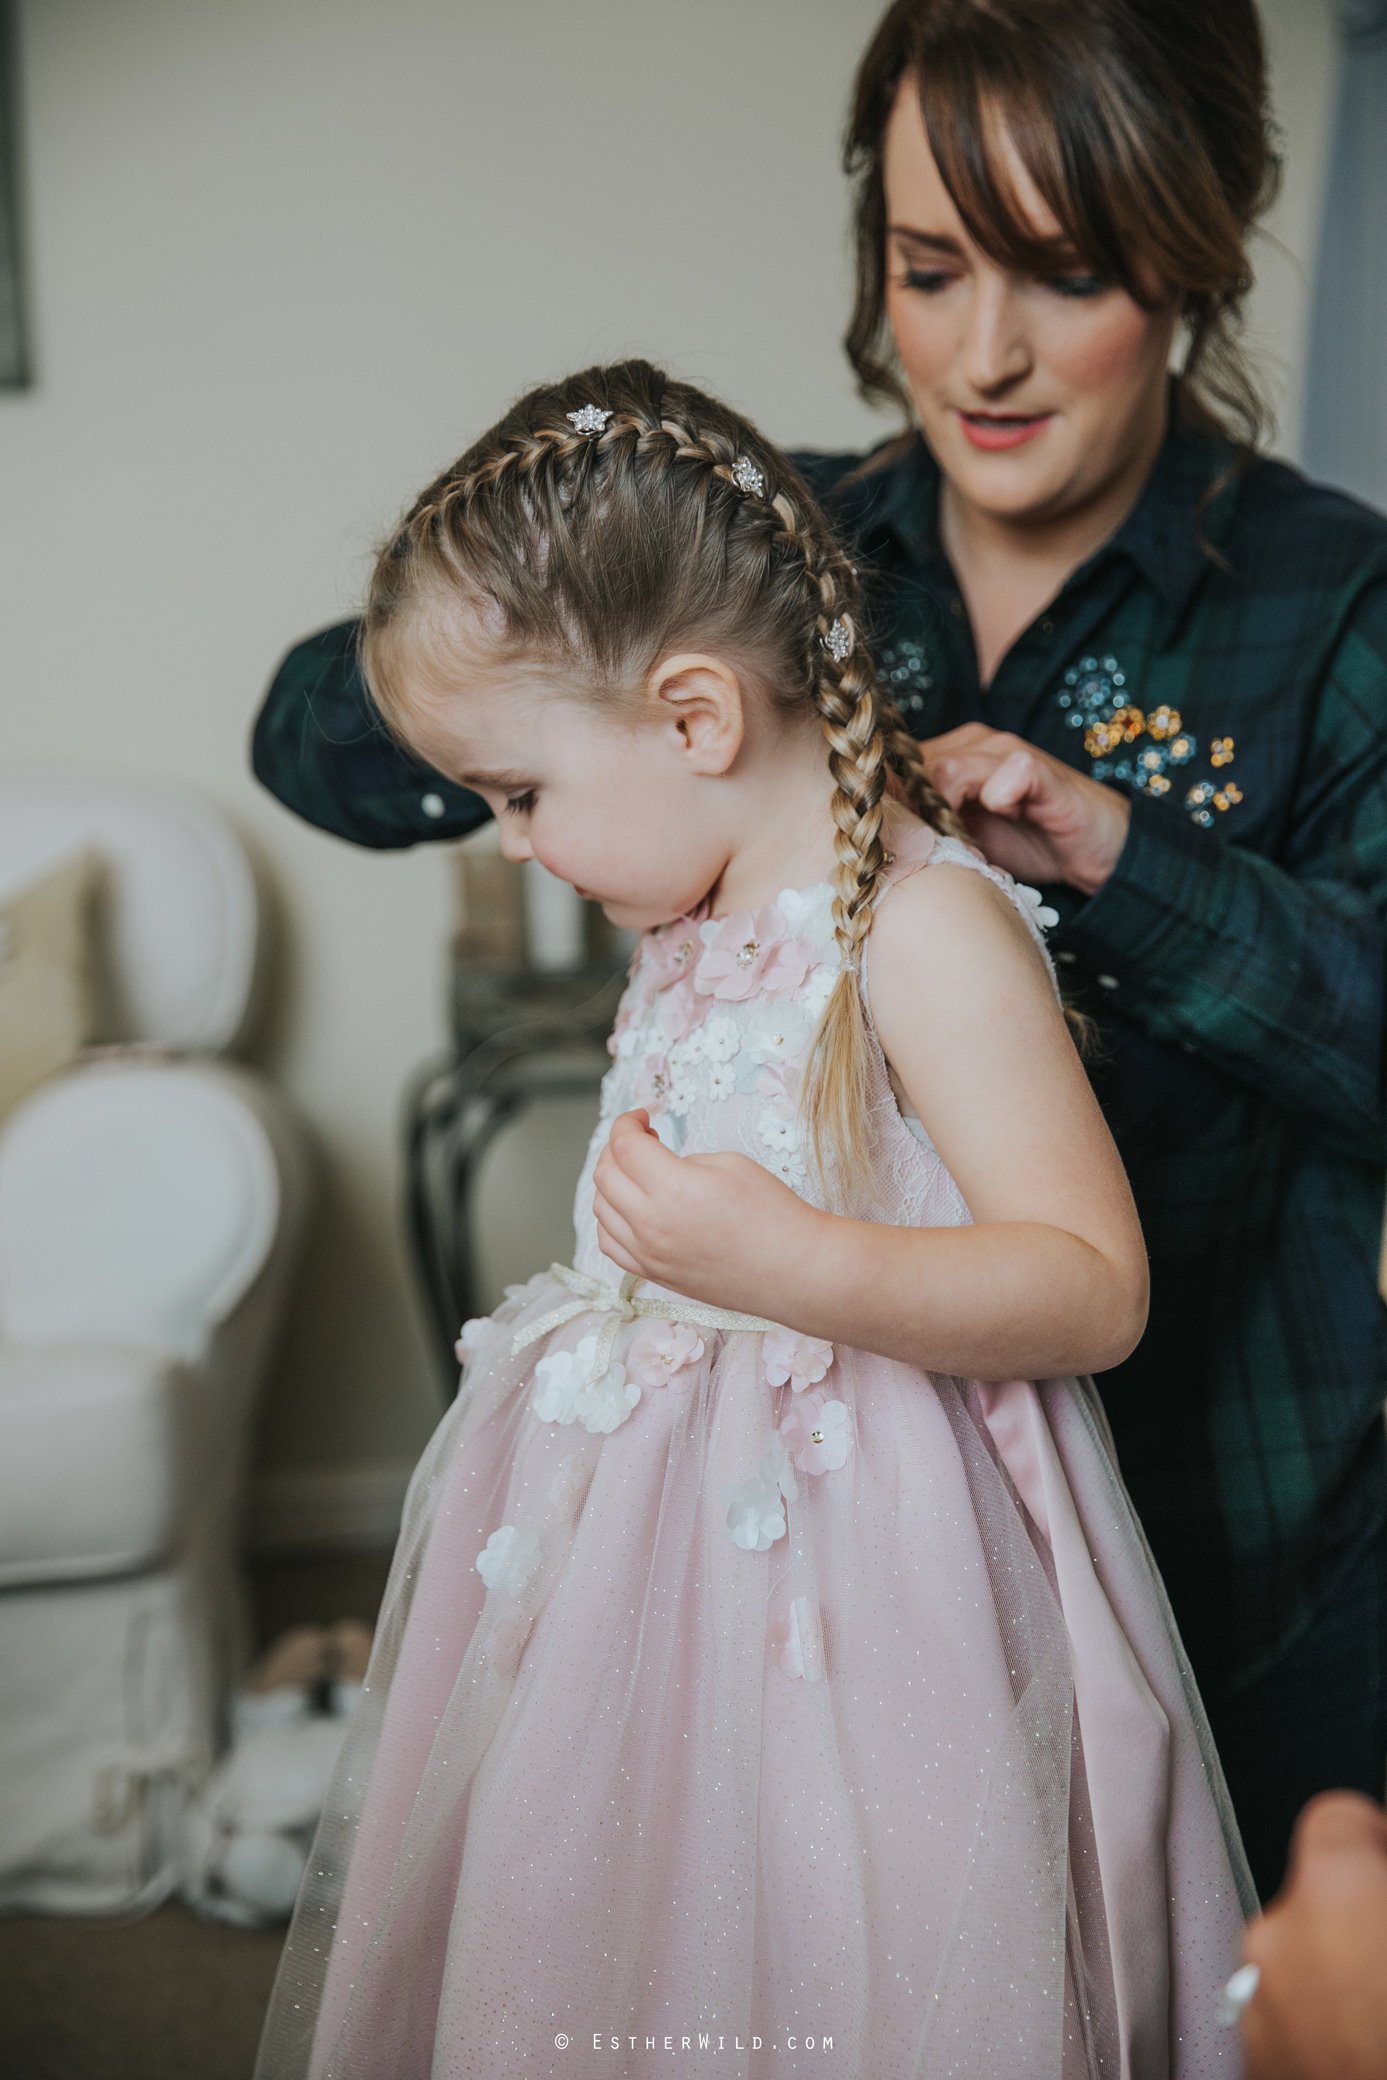 Wedding_Kings_Lynn_Town_Hall_Norfolk_Photographer_Esther_Wild_IMG_0407.jpg